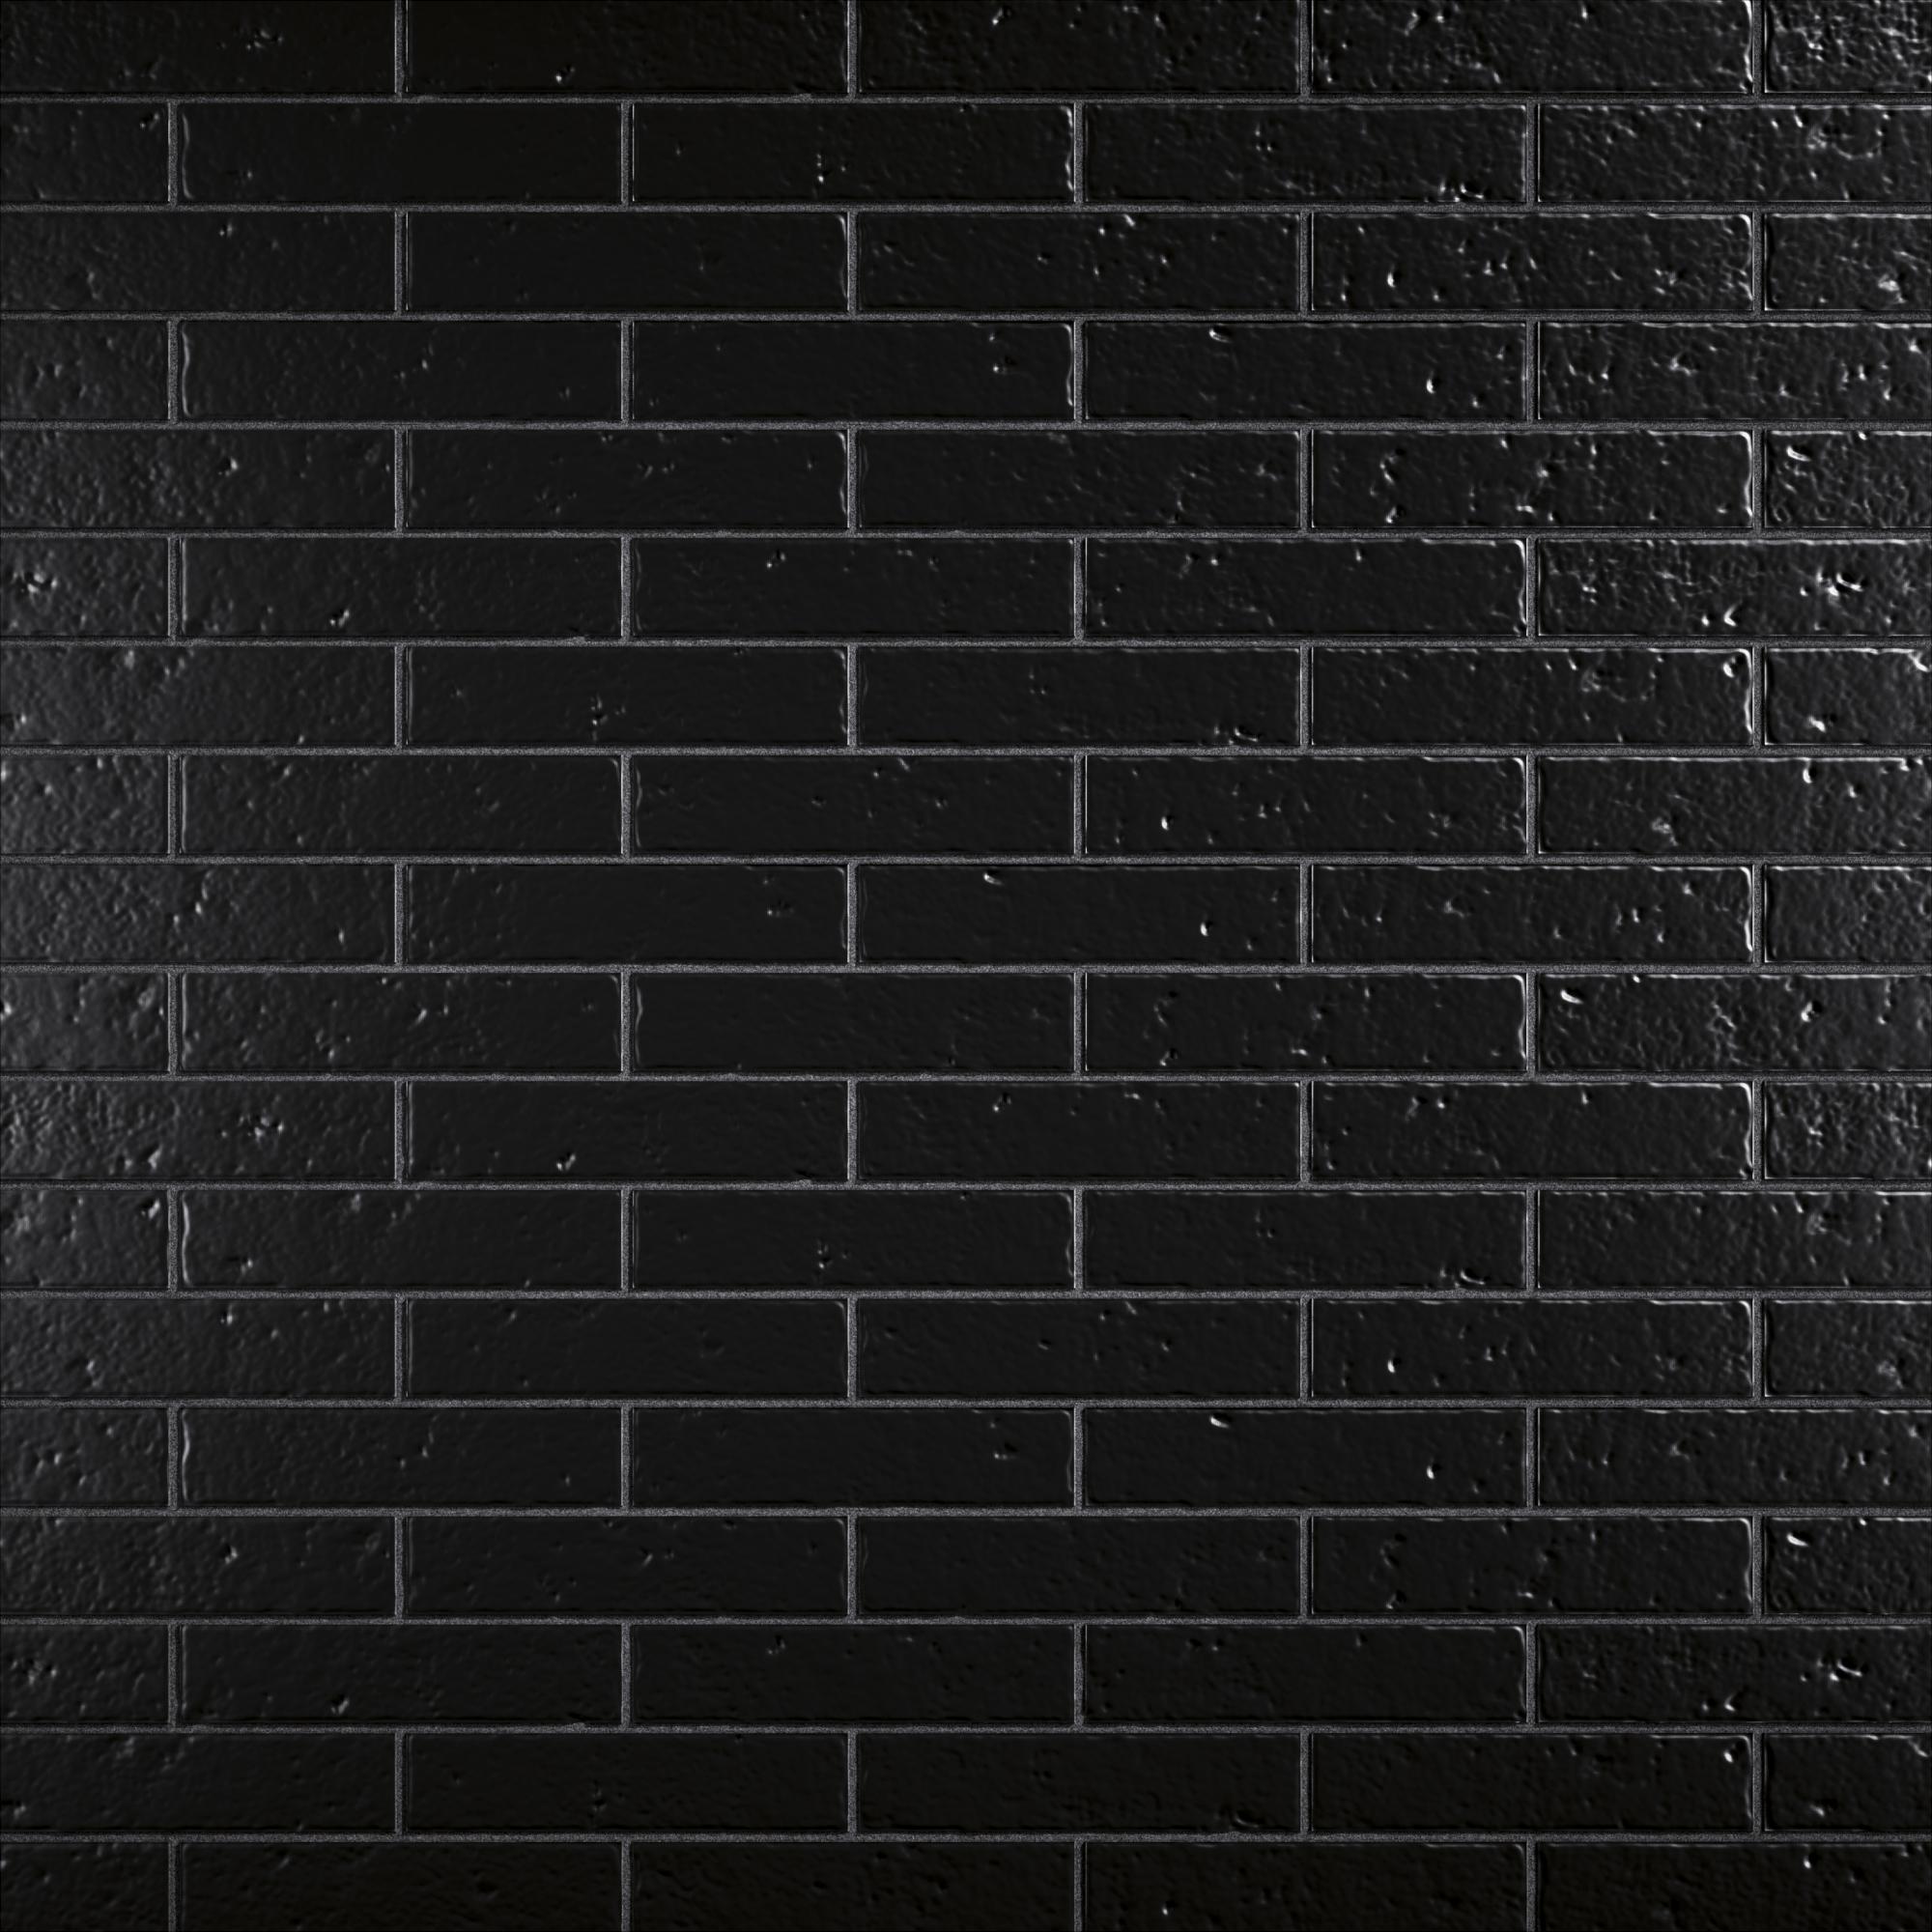 Sevilla Negro 23x24.5 cm (4bricks/biscuit) brick size: 5.8x24.5 cm